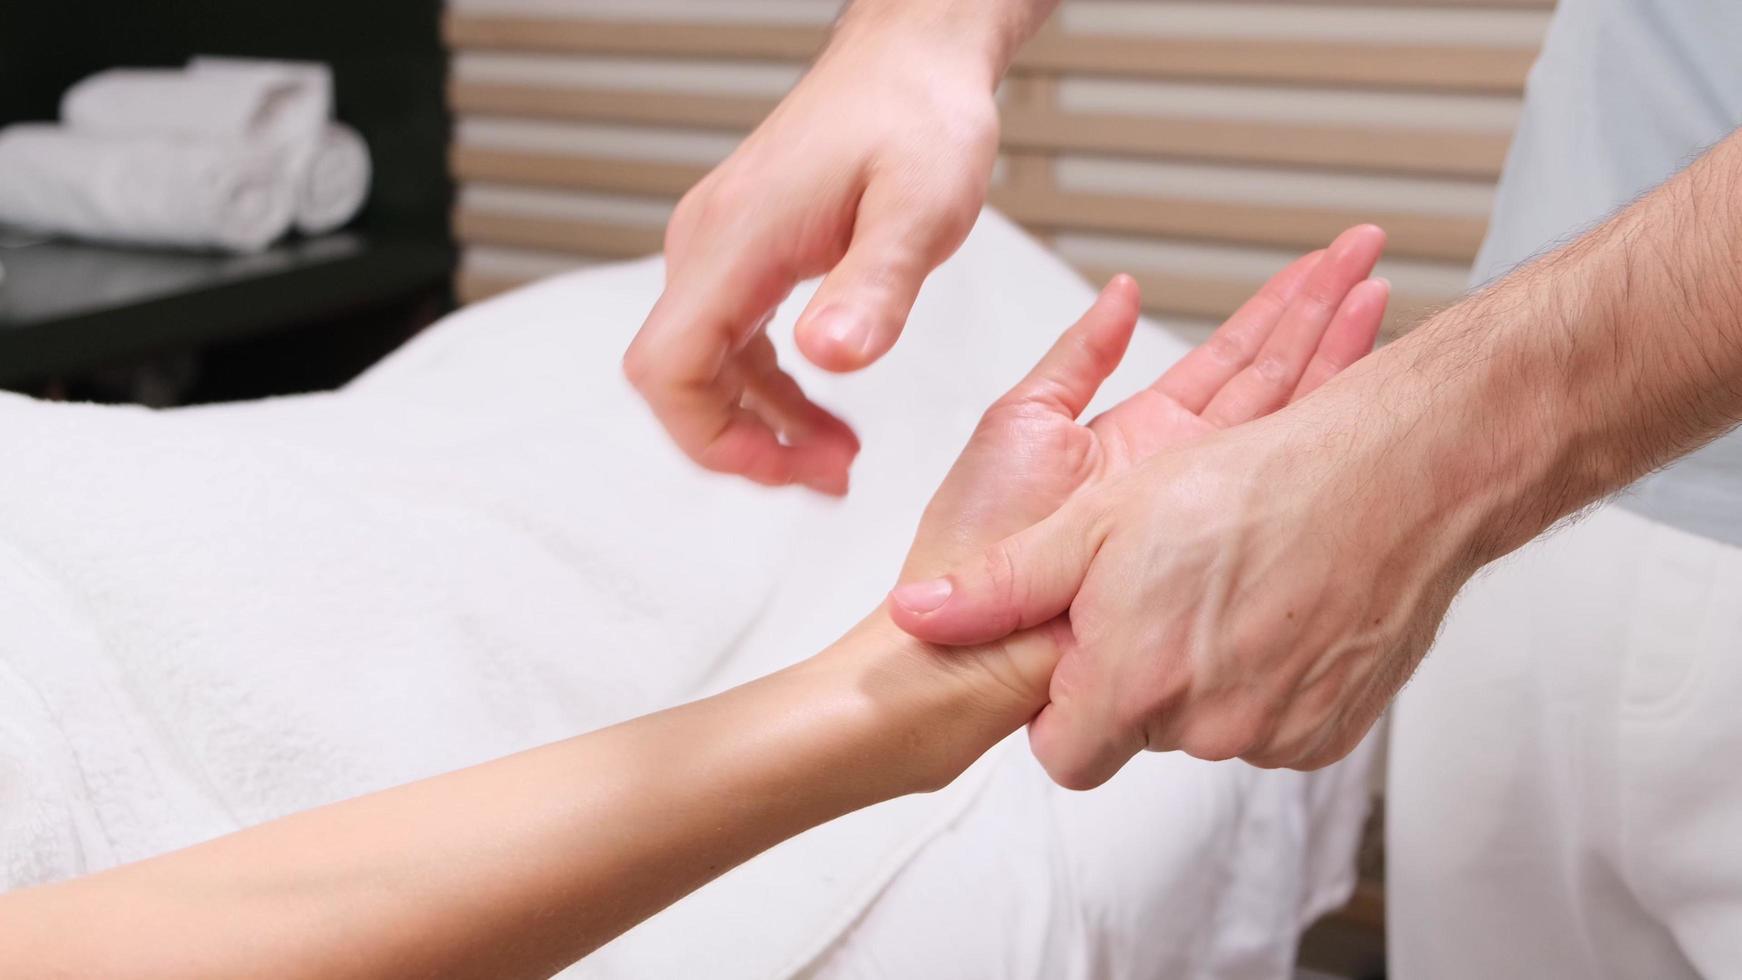 Procedure hands massage in the spa salon.Hand Care in the beauty salon. Massage the fingers and wrist in a spa salon. Spa manicure procedure. photo